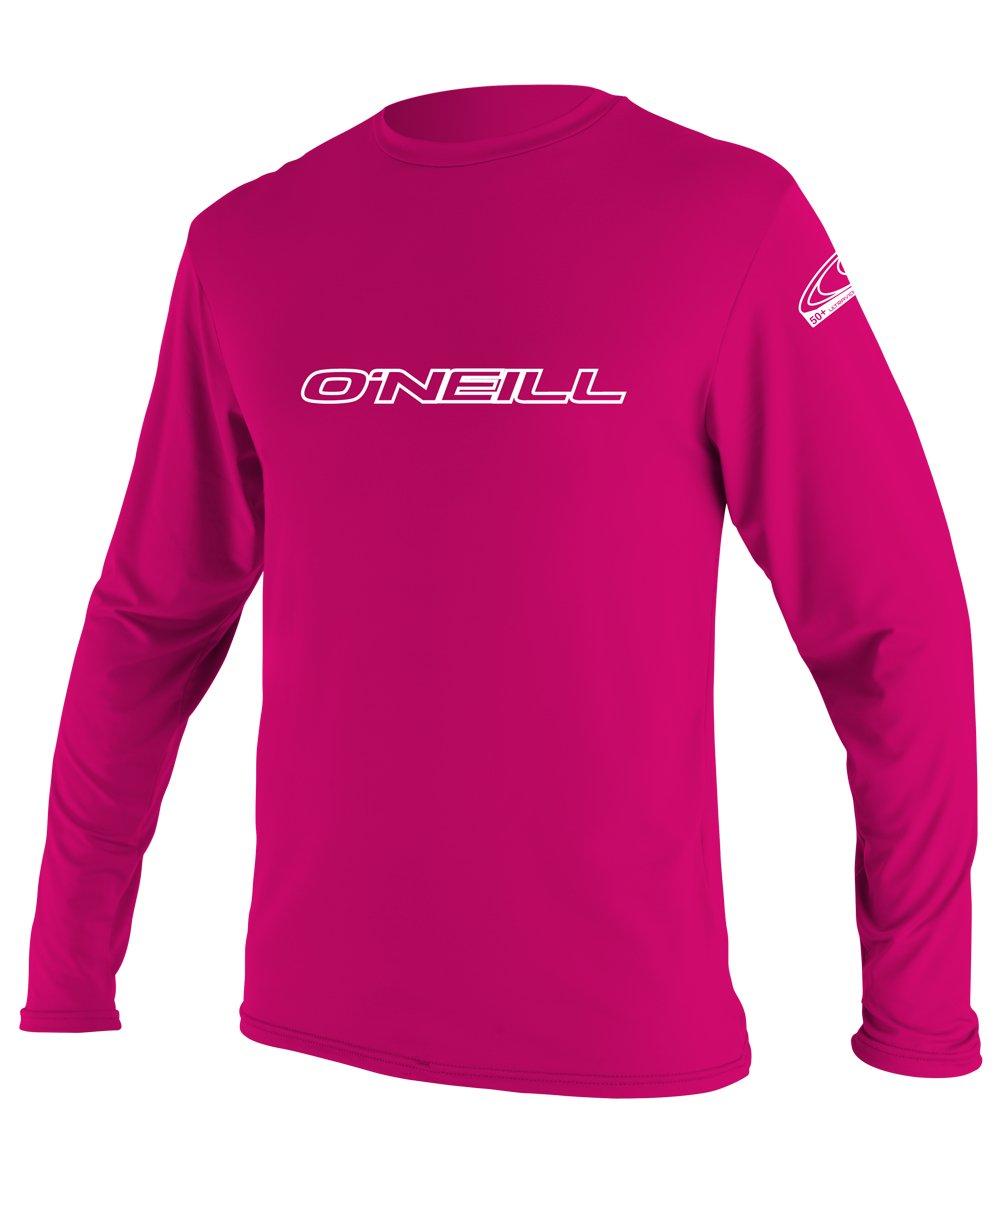 O'Neill Youth Basic Skins UPF 50+ Long Sleeve Sun Shirt, Watermelon, 6